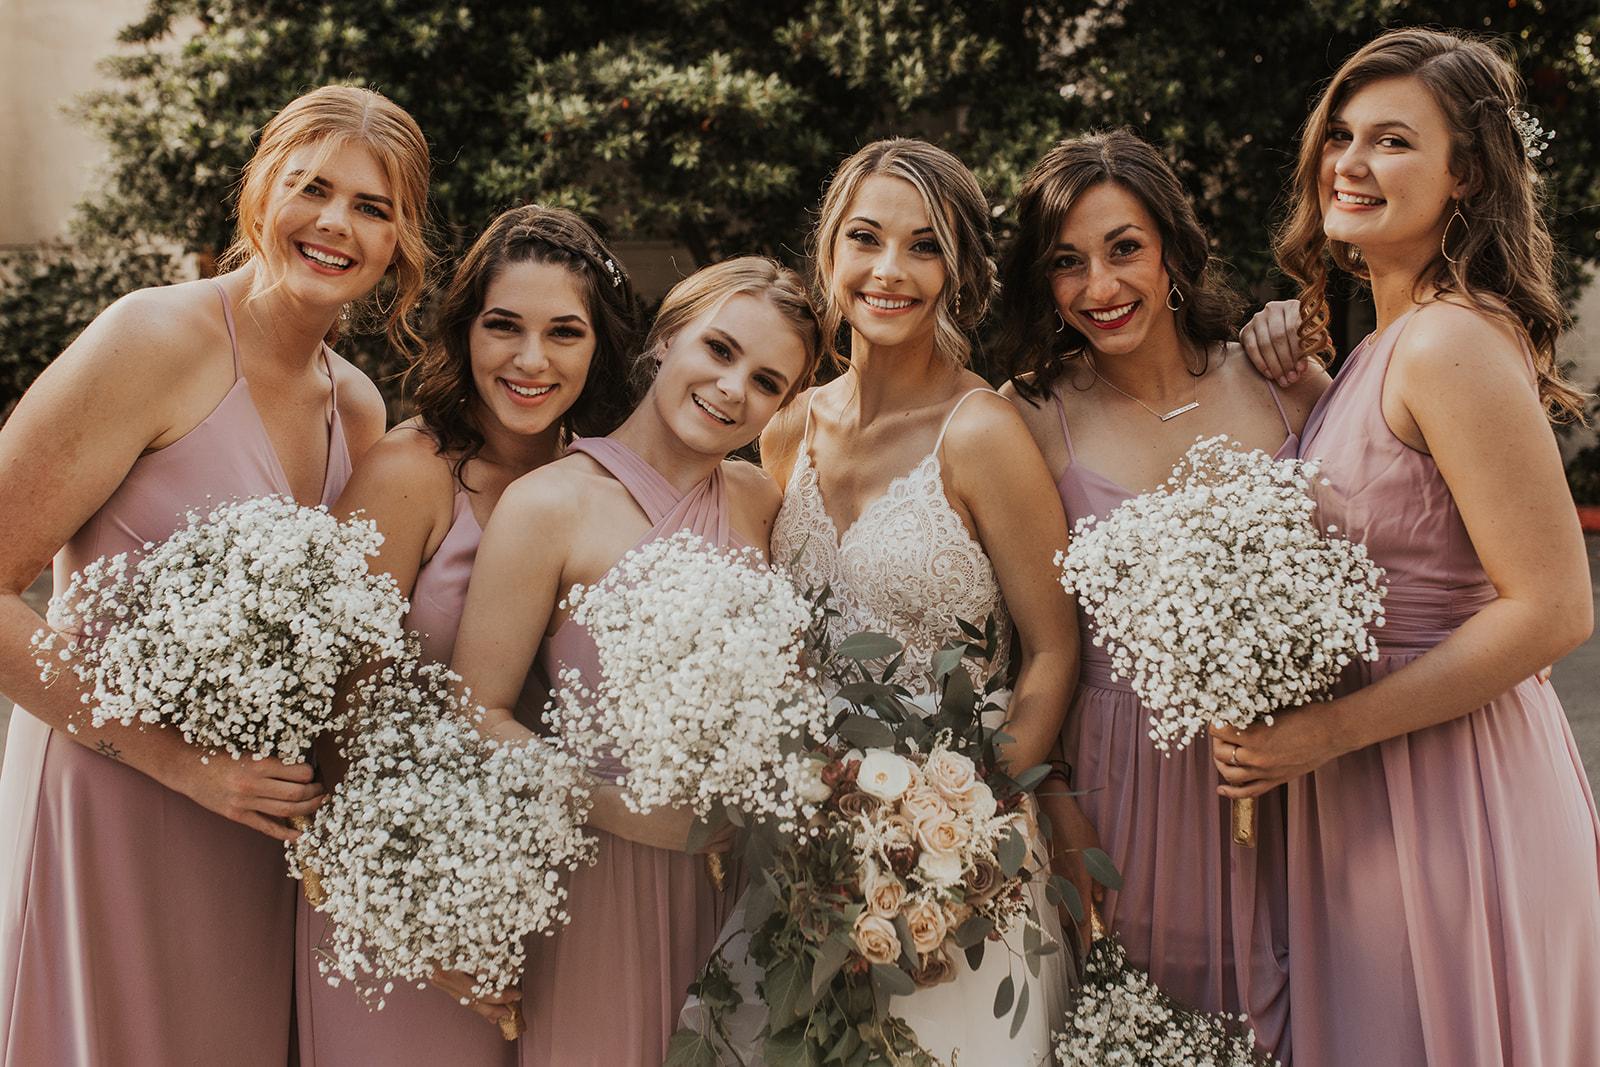 laughing bridal party spokane bride